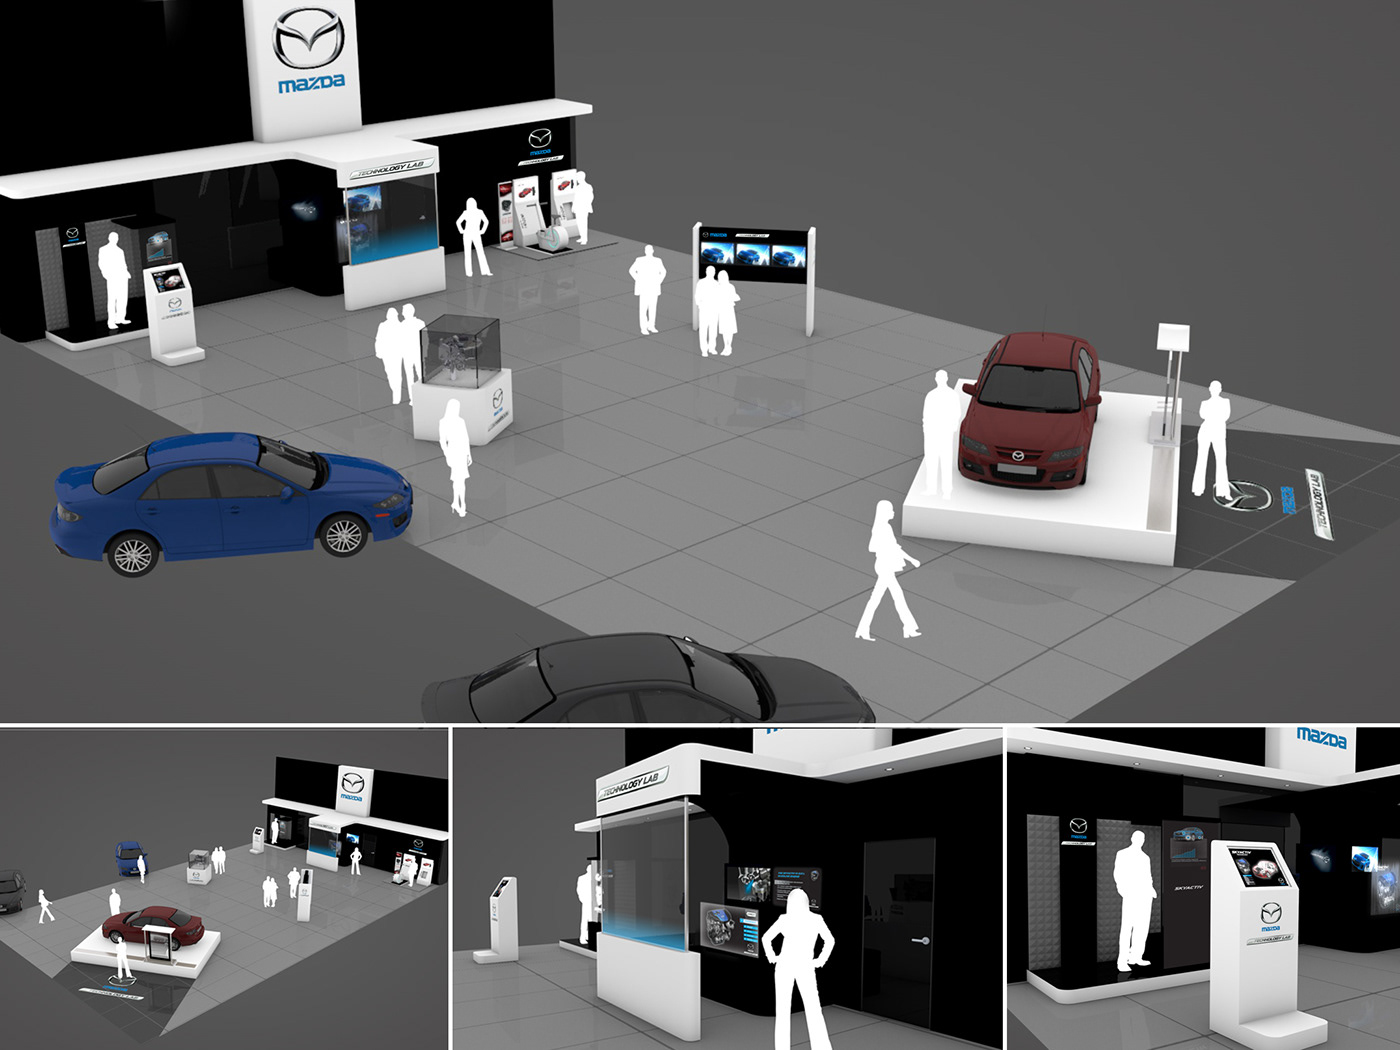 mazda car Technology Laboratoire